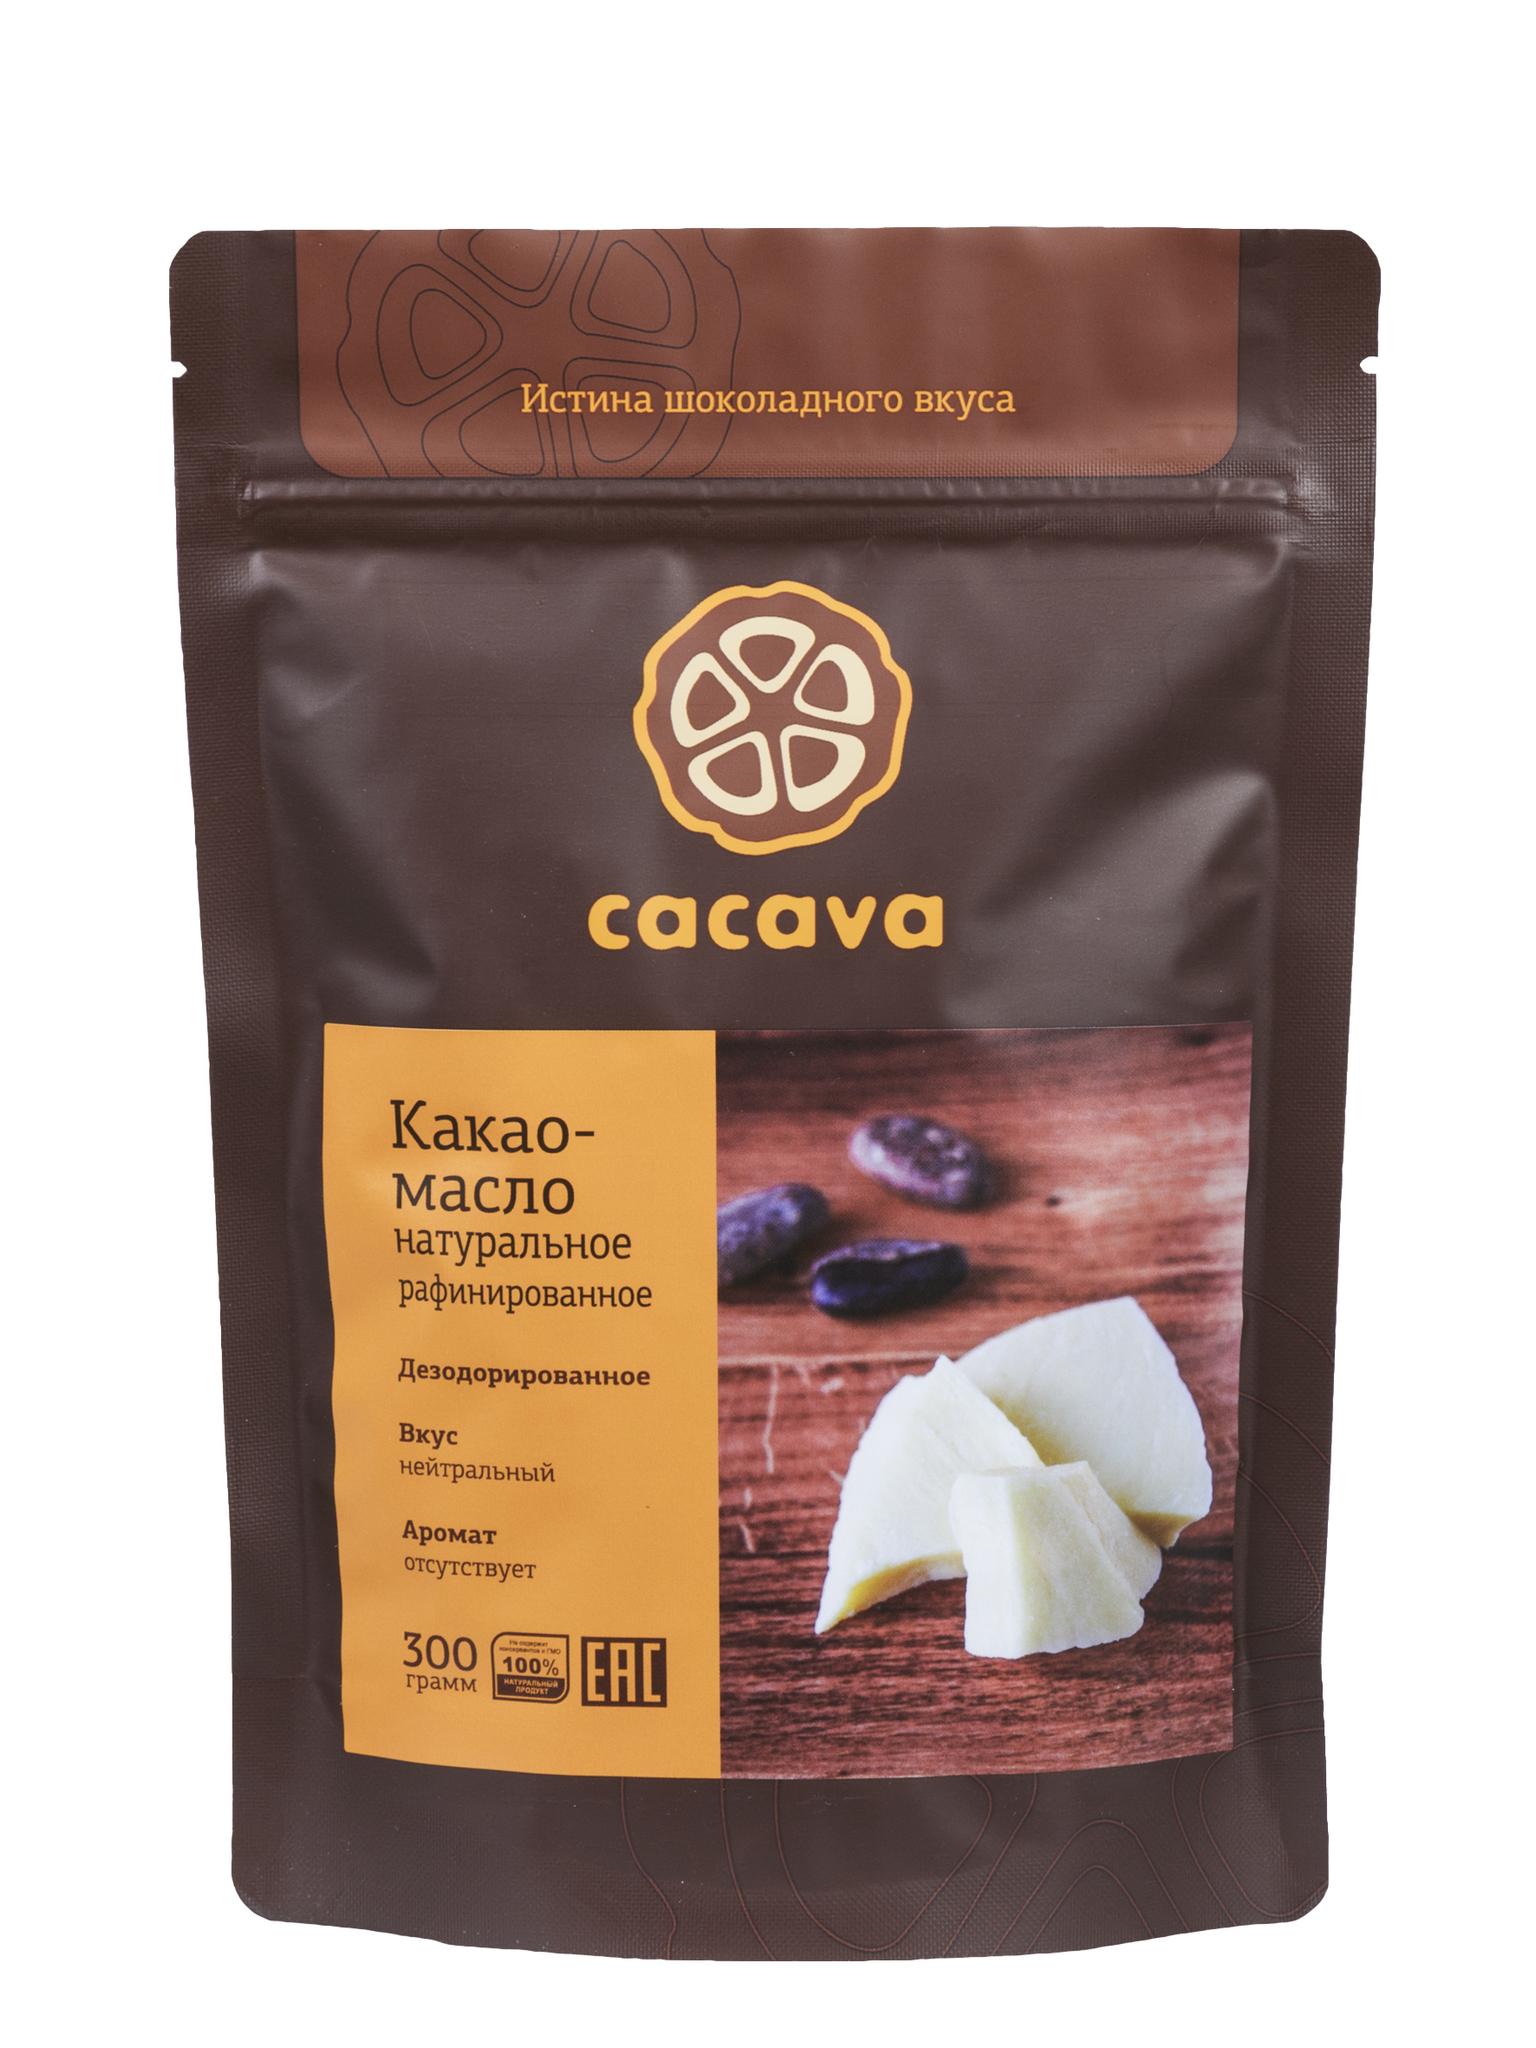 Какао-масло рафинированное, упаковка 300 грамм